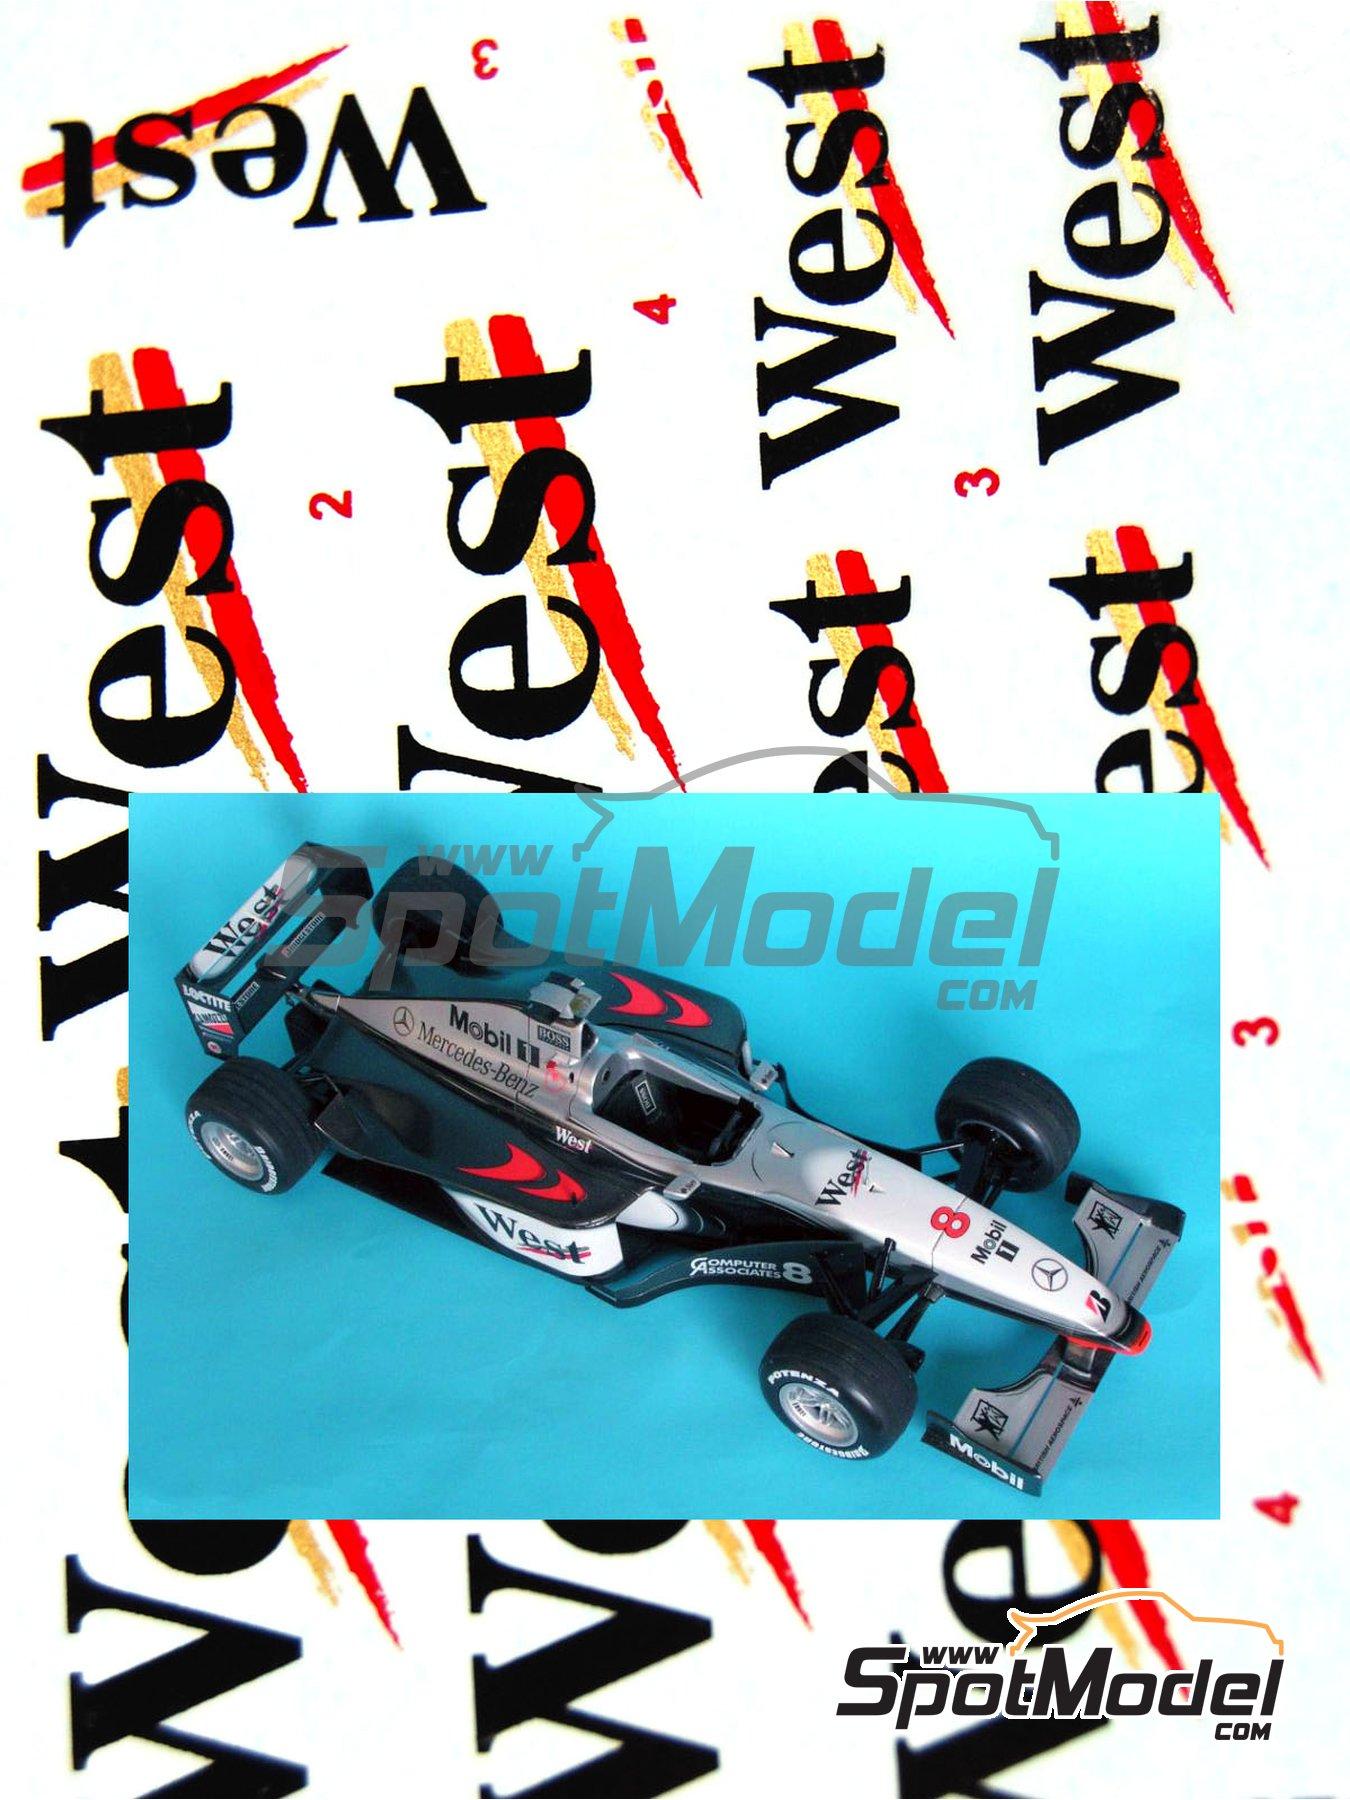 McLaren Mercedes MP4/13 West - FIA Formula 1 World Championship 1998 | Marking / livery in 1/20 scale manufactured by Reji Model (ref.REJI-025) image